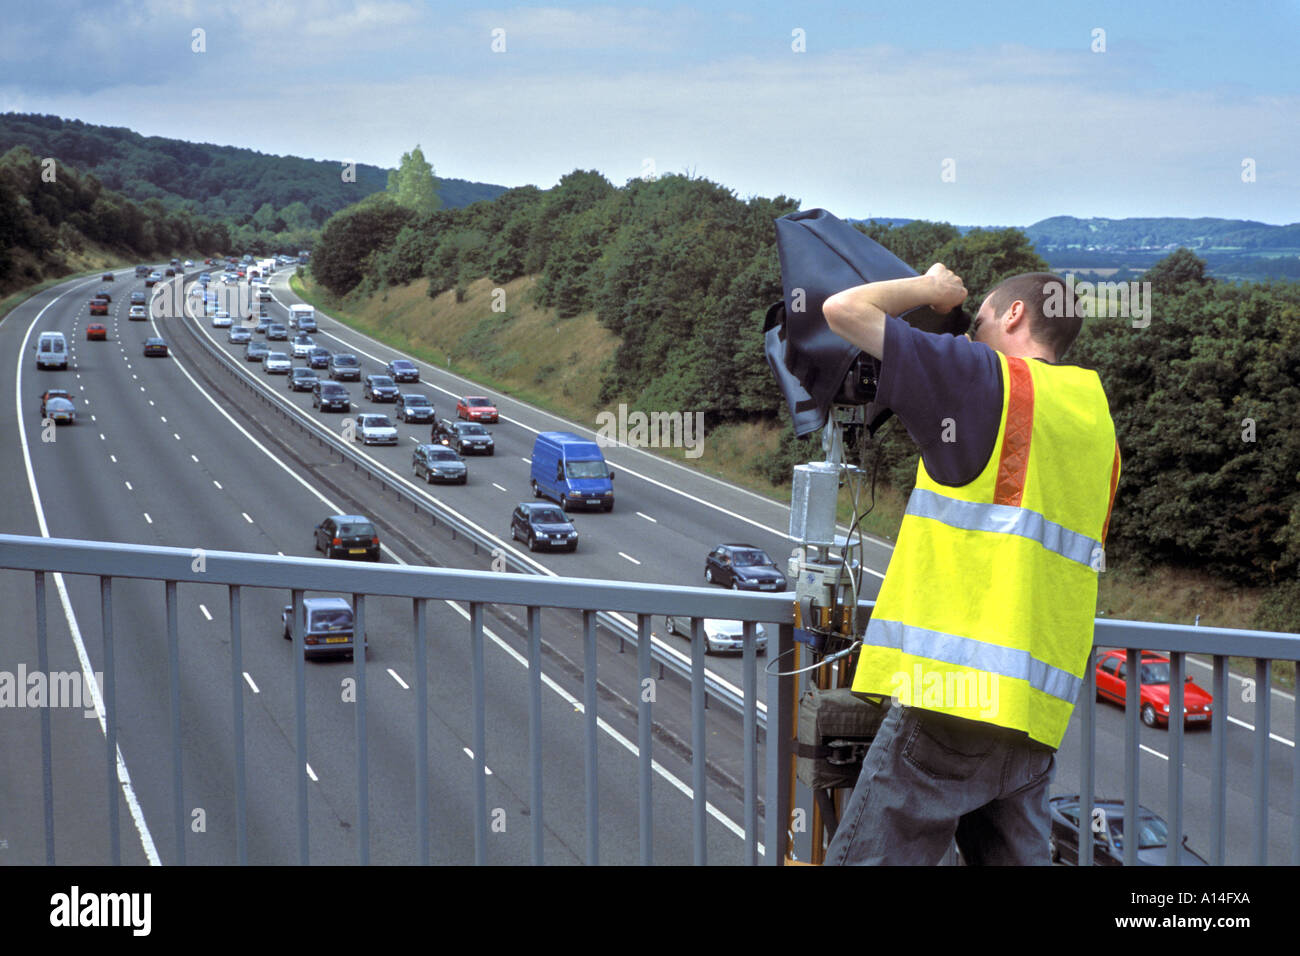 M5 Traffic Cameras Live >> Video Camera Monitoring Traffic Flow On The M5 Motorway Near Gordano